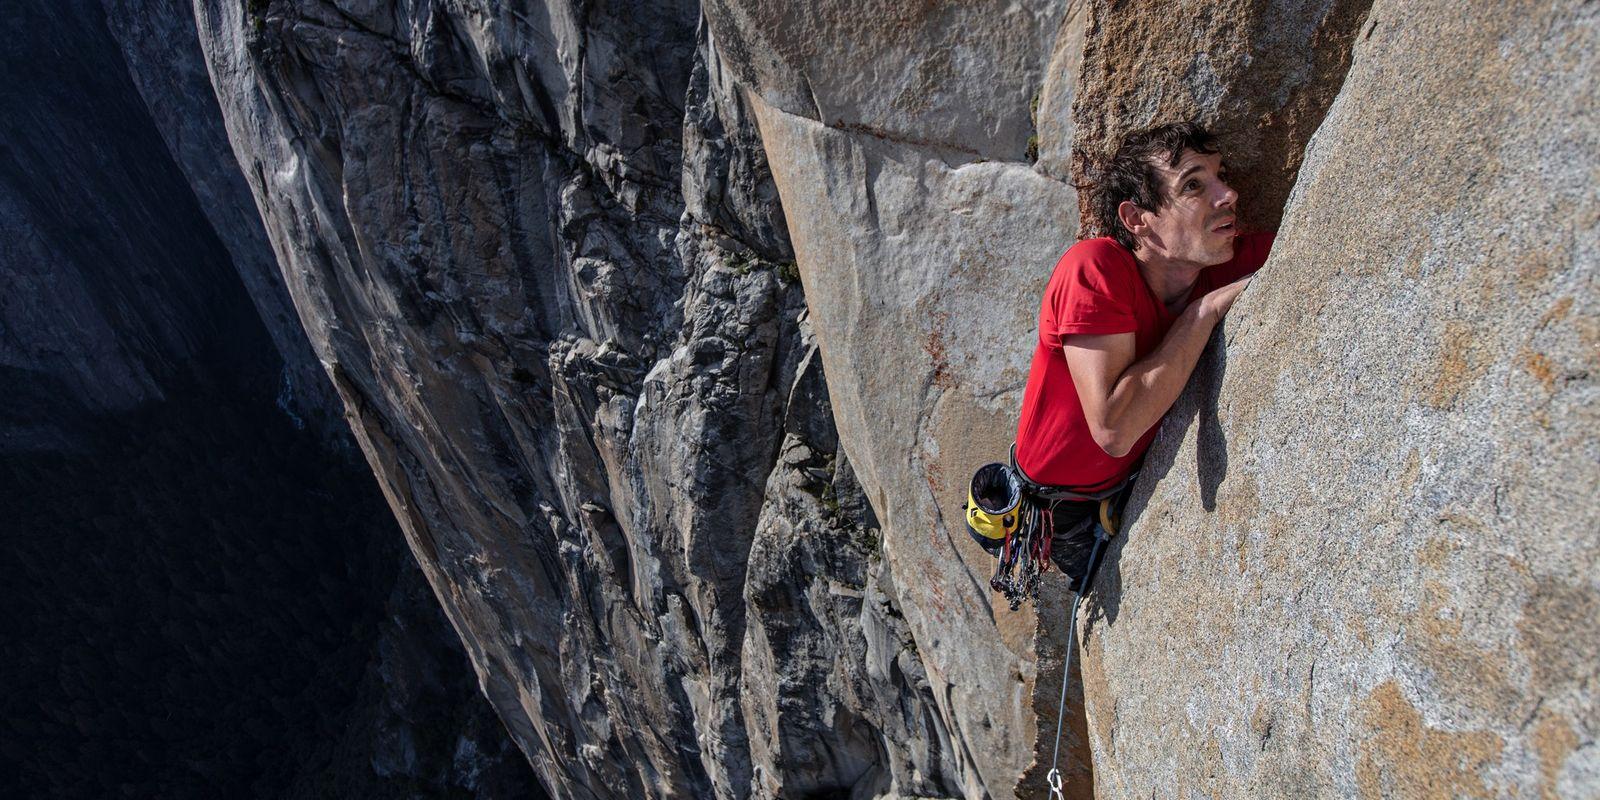 D'El Capitan aux Oscars : la vertigineuse ascension d'Alex Honnold